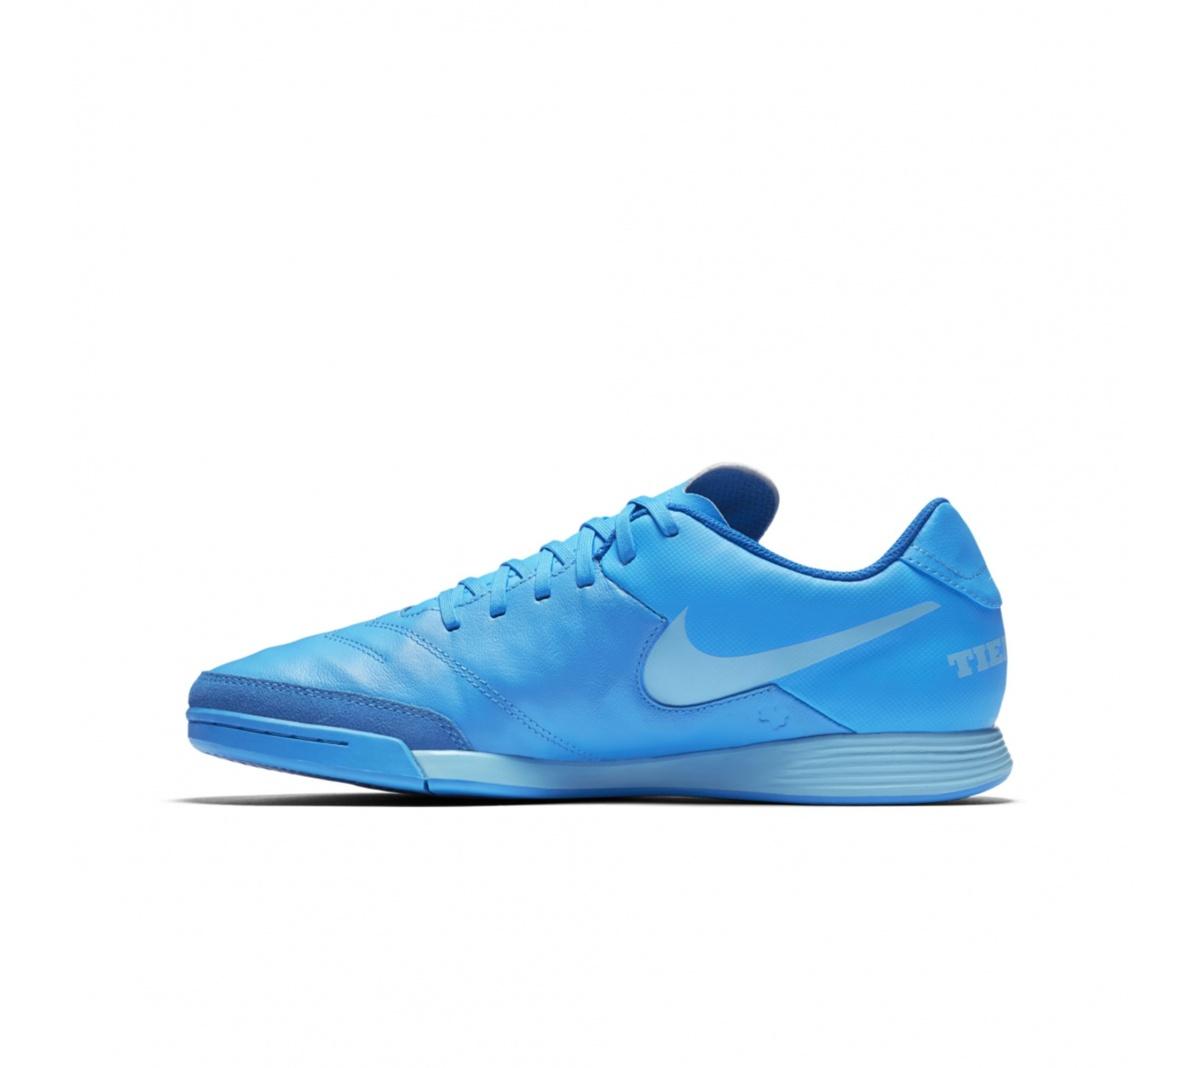 Tênis Nike TiempoX Gênio Leather Futsal - Mundo do Futebol 0c4e22ff5d445